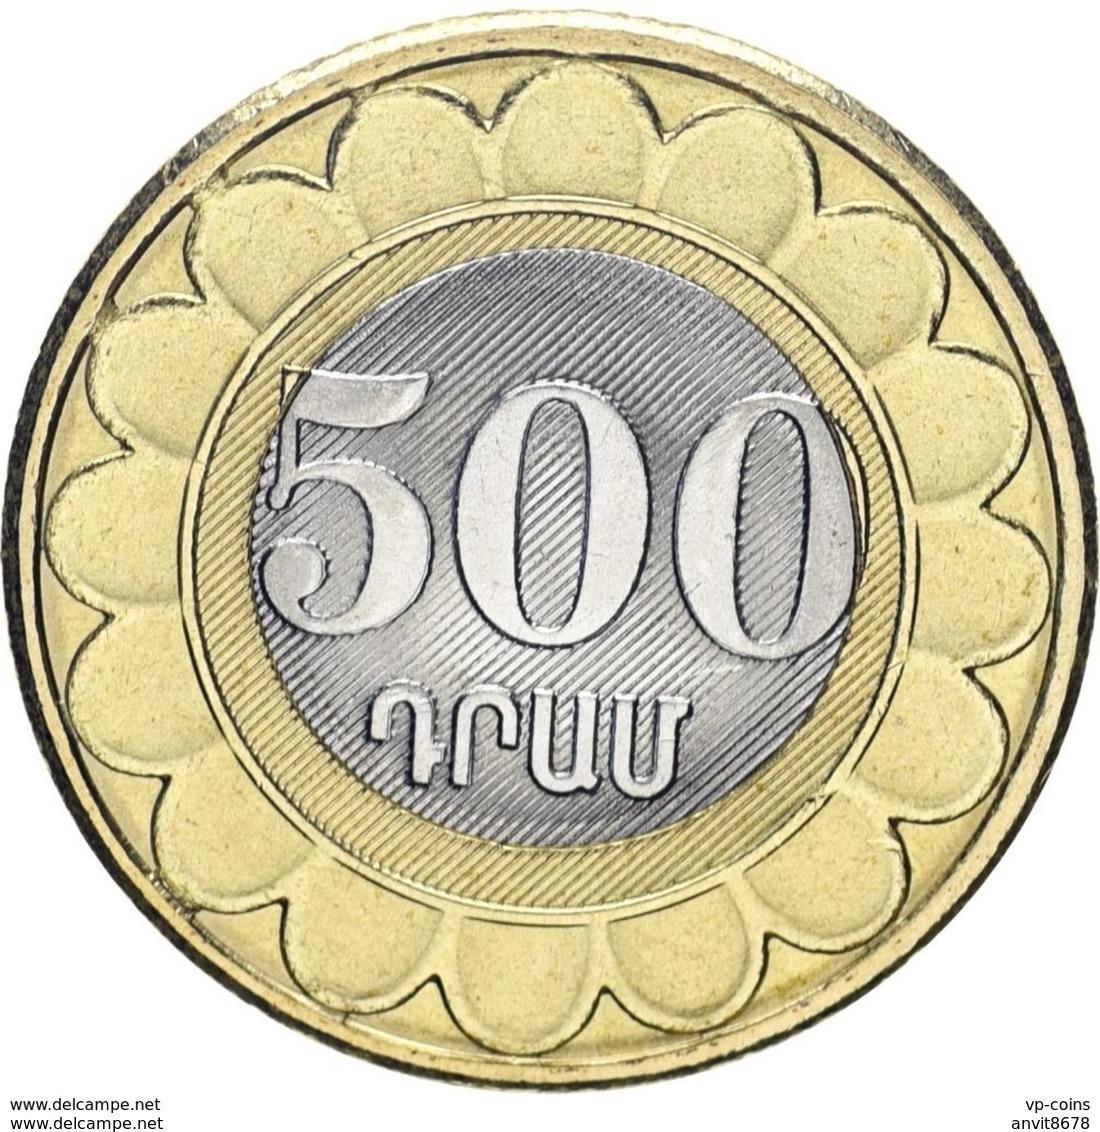 ARMENIA  500 DRAM  2003 UNC - Arménie